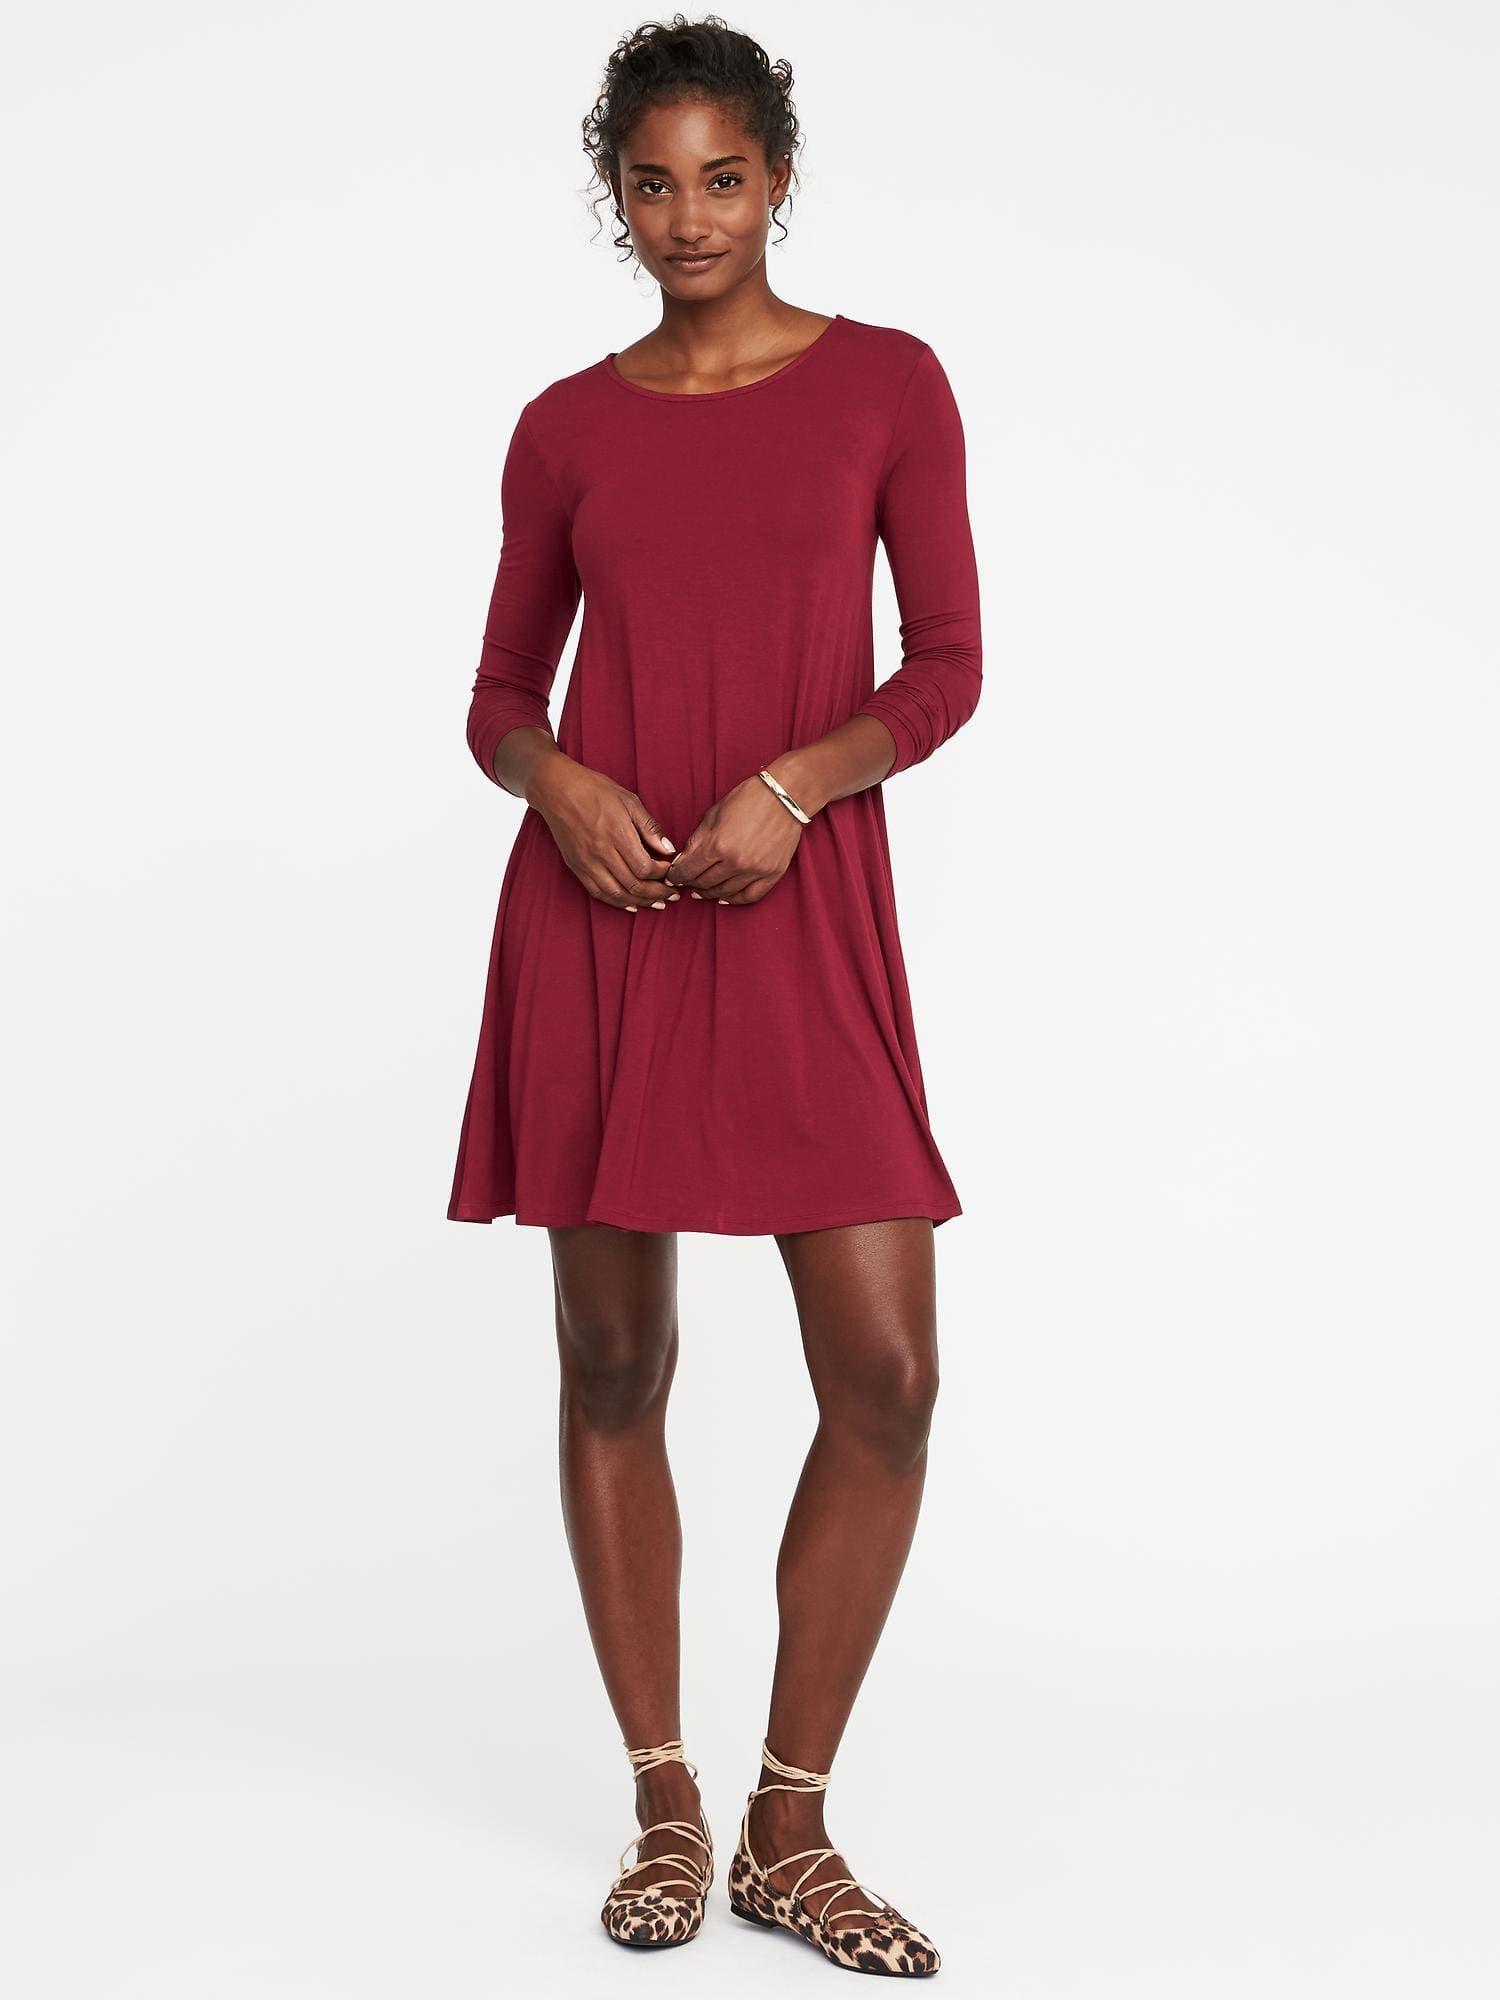 612df10f516e2 Old Navy Jersey-Knit Swing Dress $30 - Shade: Gosh Garnet | My ...